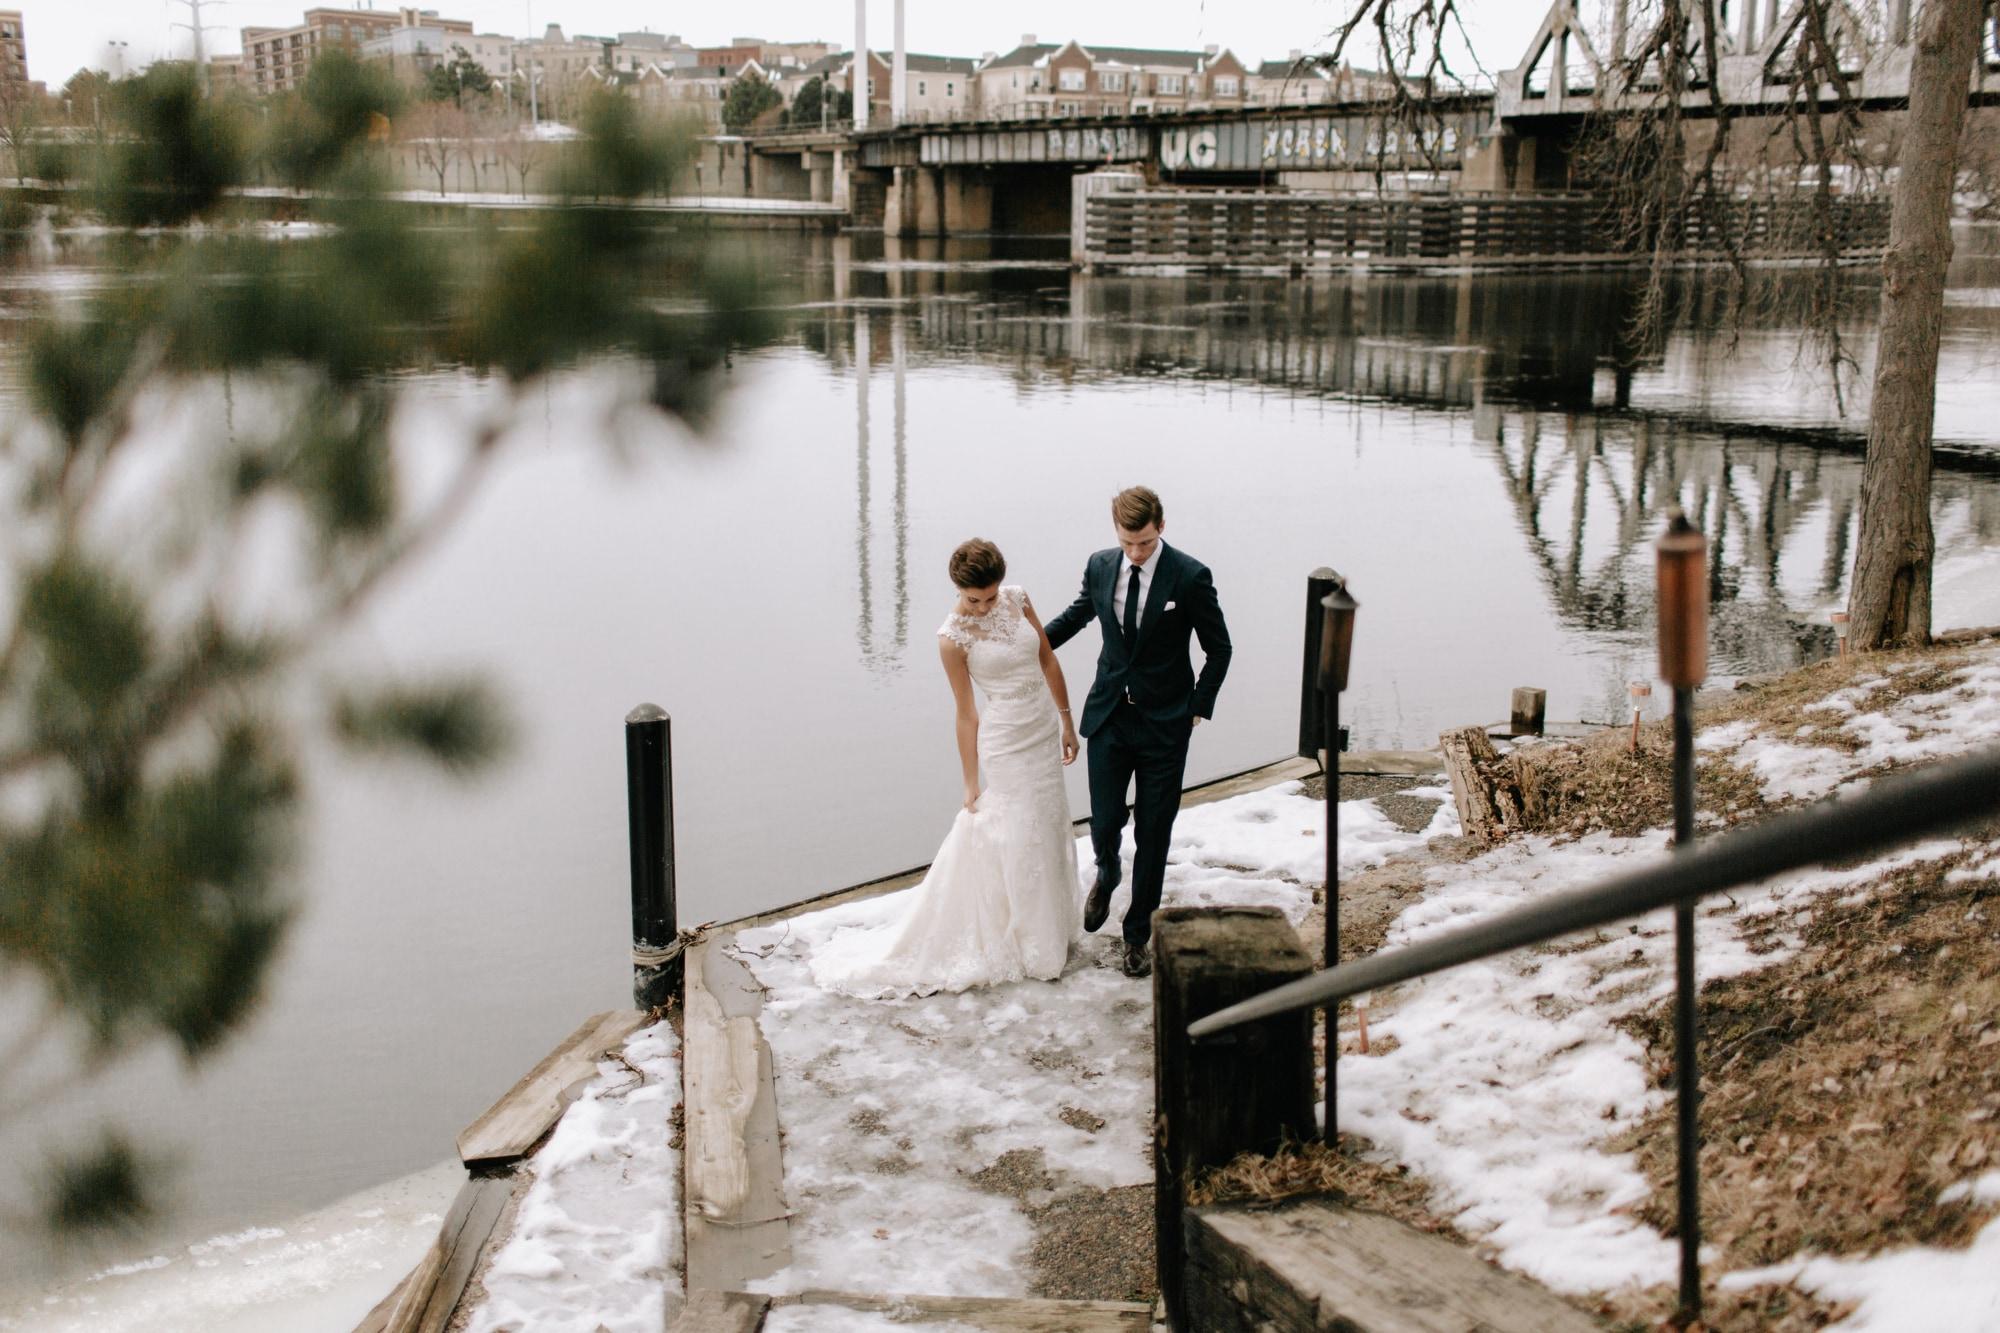 Nicollet-Island-Pavilion-Winter-Wedding-Minneapolis_24.jpg